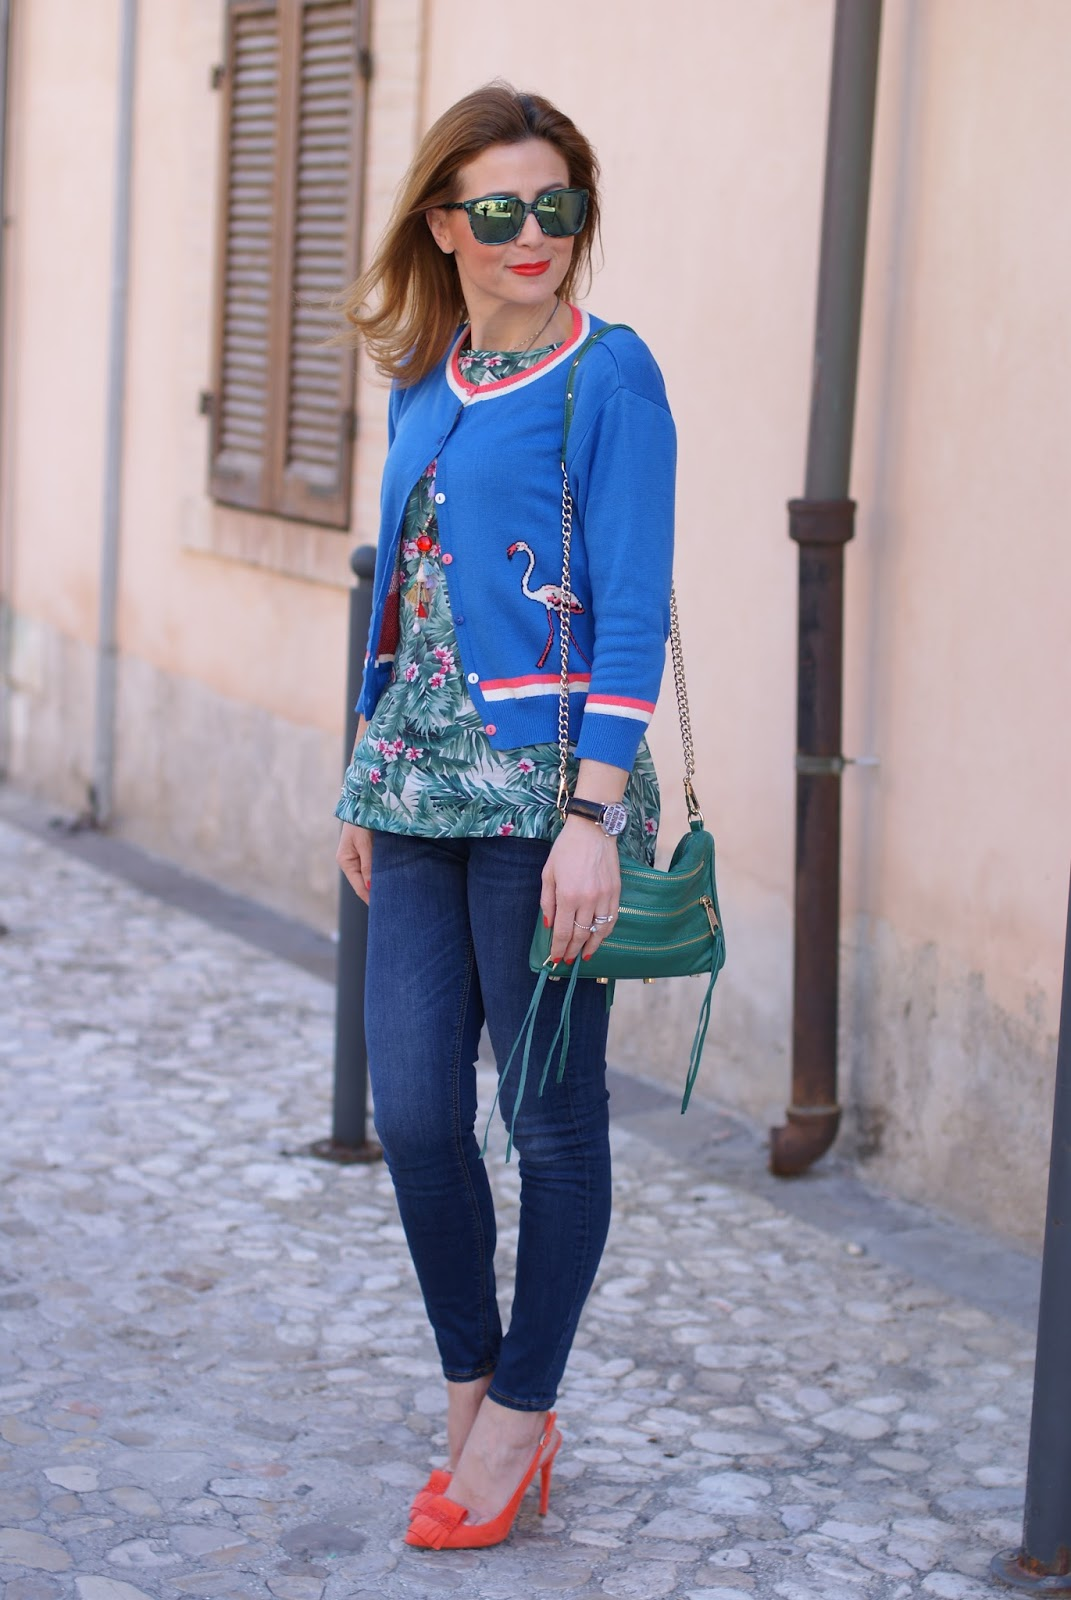 Bryony flamingo cardigan and Mismash Askani t-shirt on Fashion and Cookies fashion blog, fashion blogger style